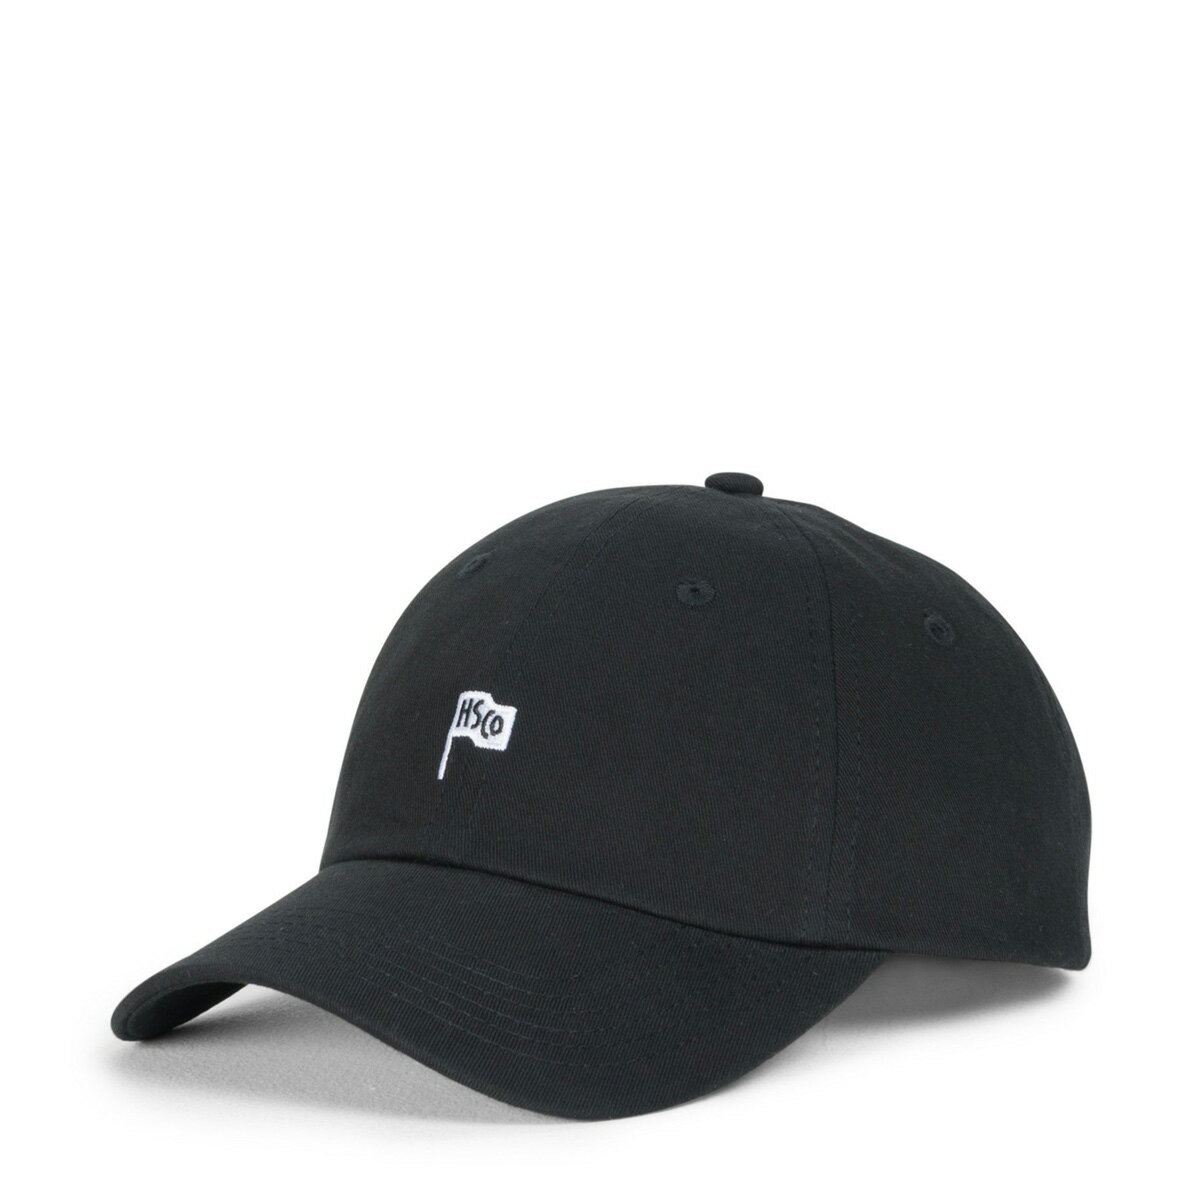 Herschel Supply Co SYLAS CAP(ハーシェル サプライ サイラス キャップ)Black【キャップ】CRYOVR